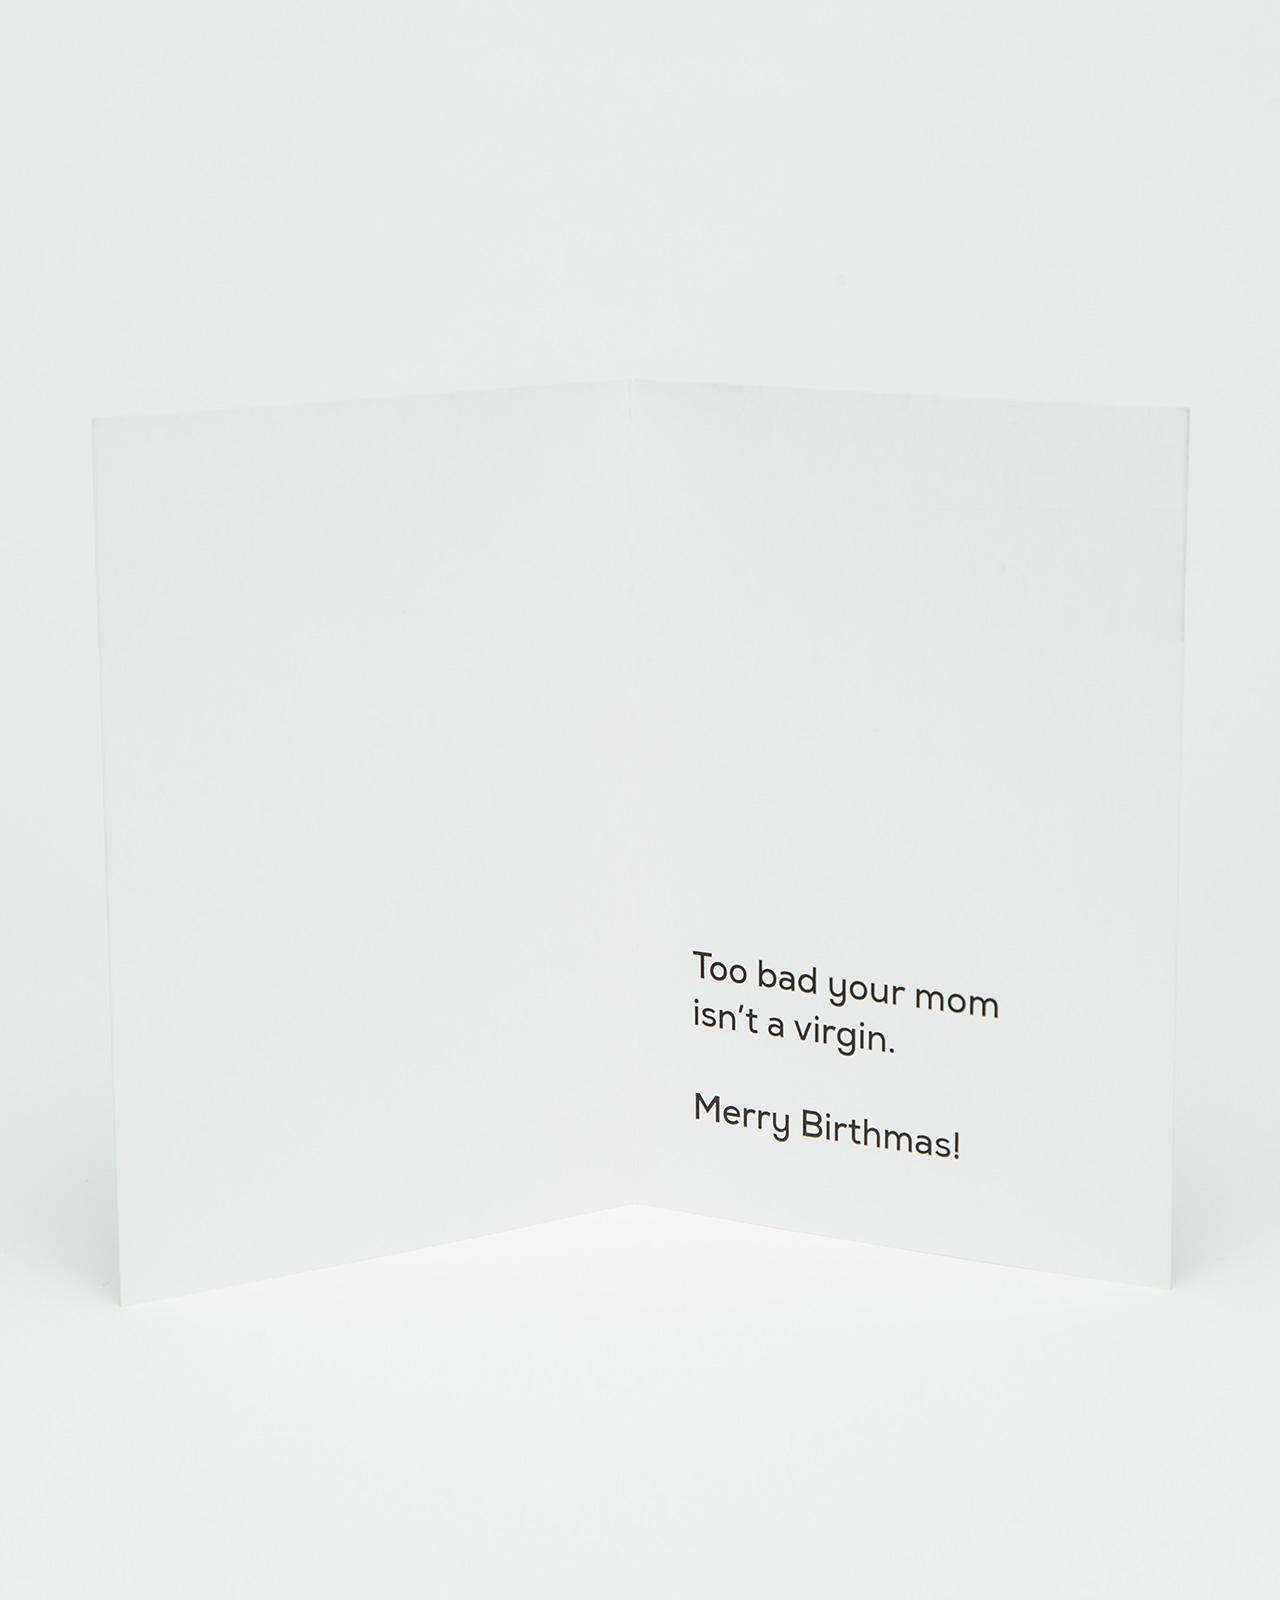 merry-birthmas-2